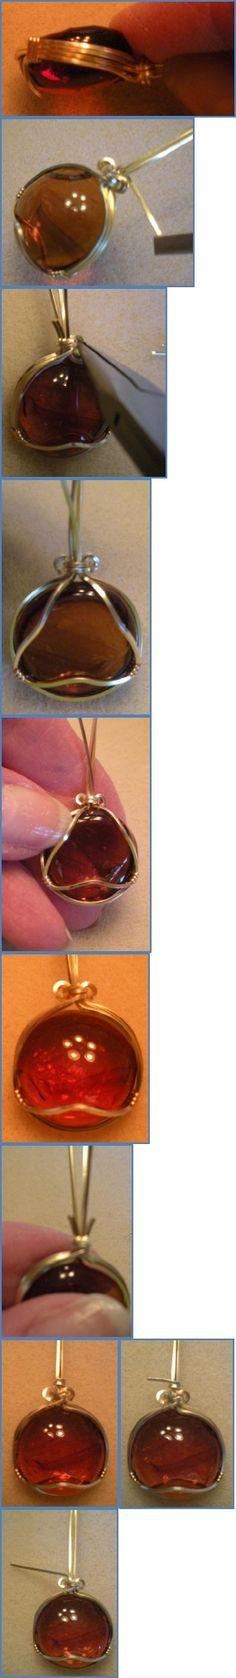 Glass Pebble Cabochon Pendant Tutorial   Scribd